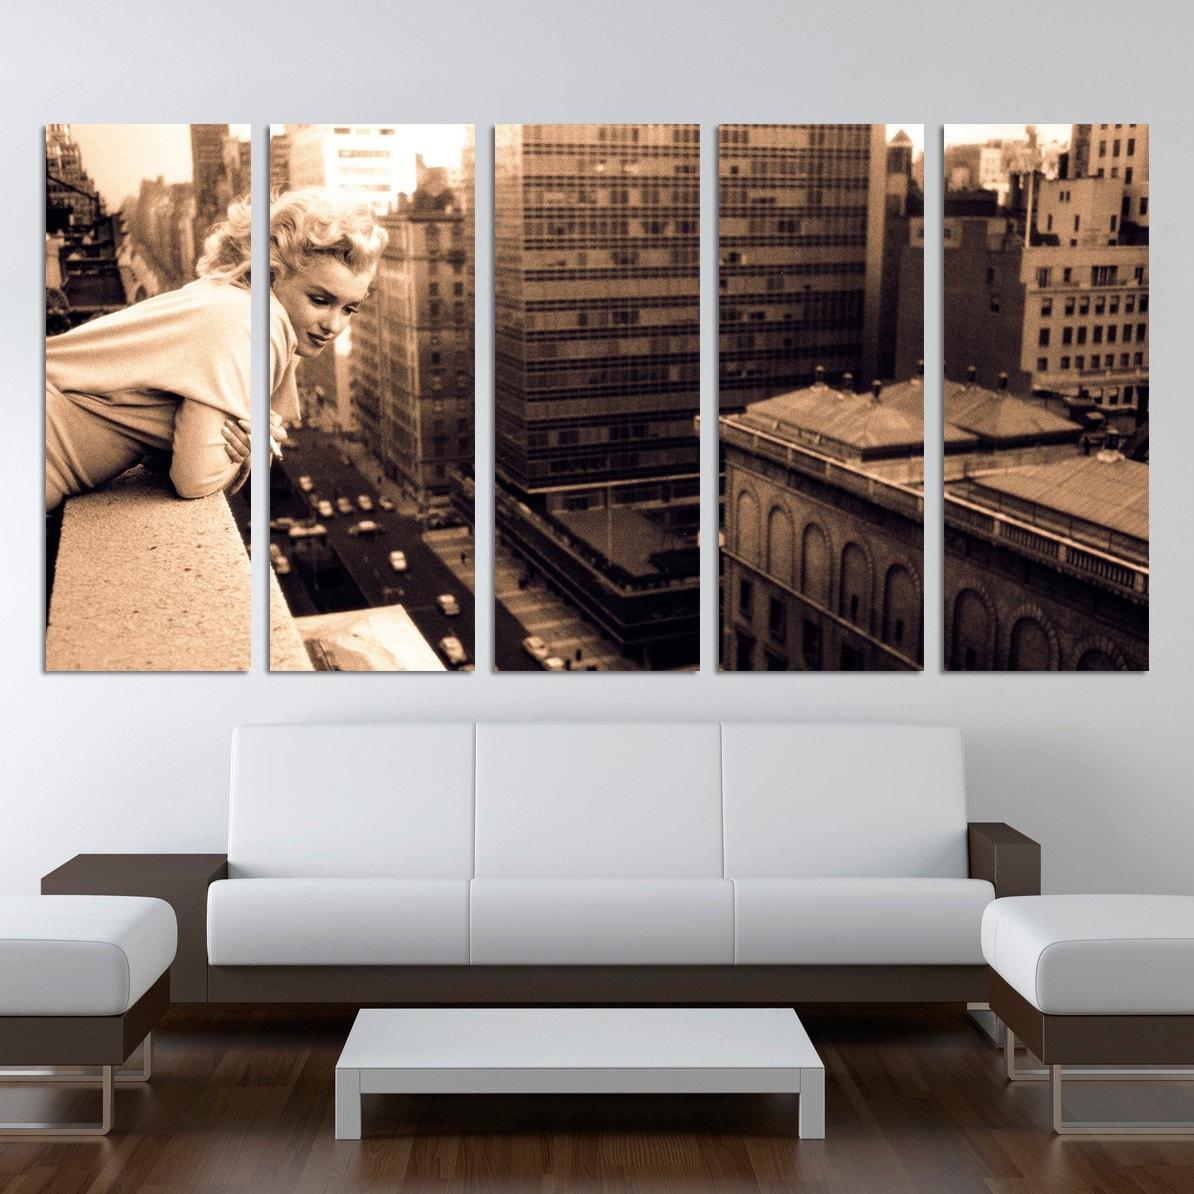 Chicago Home Decor Stores: Marilyn Monroe 5 Split Panels Home Decor Chicago Canvas Prints